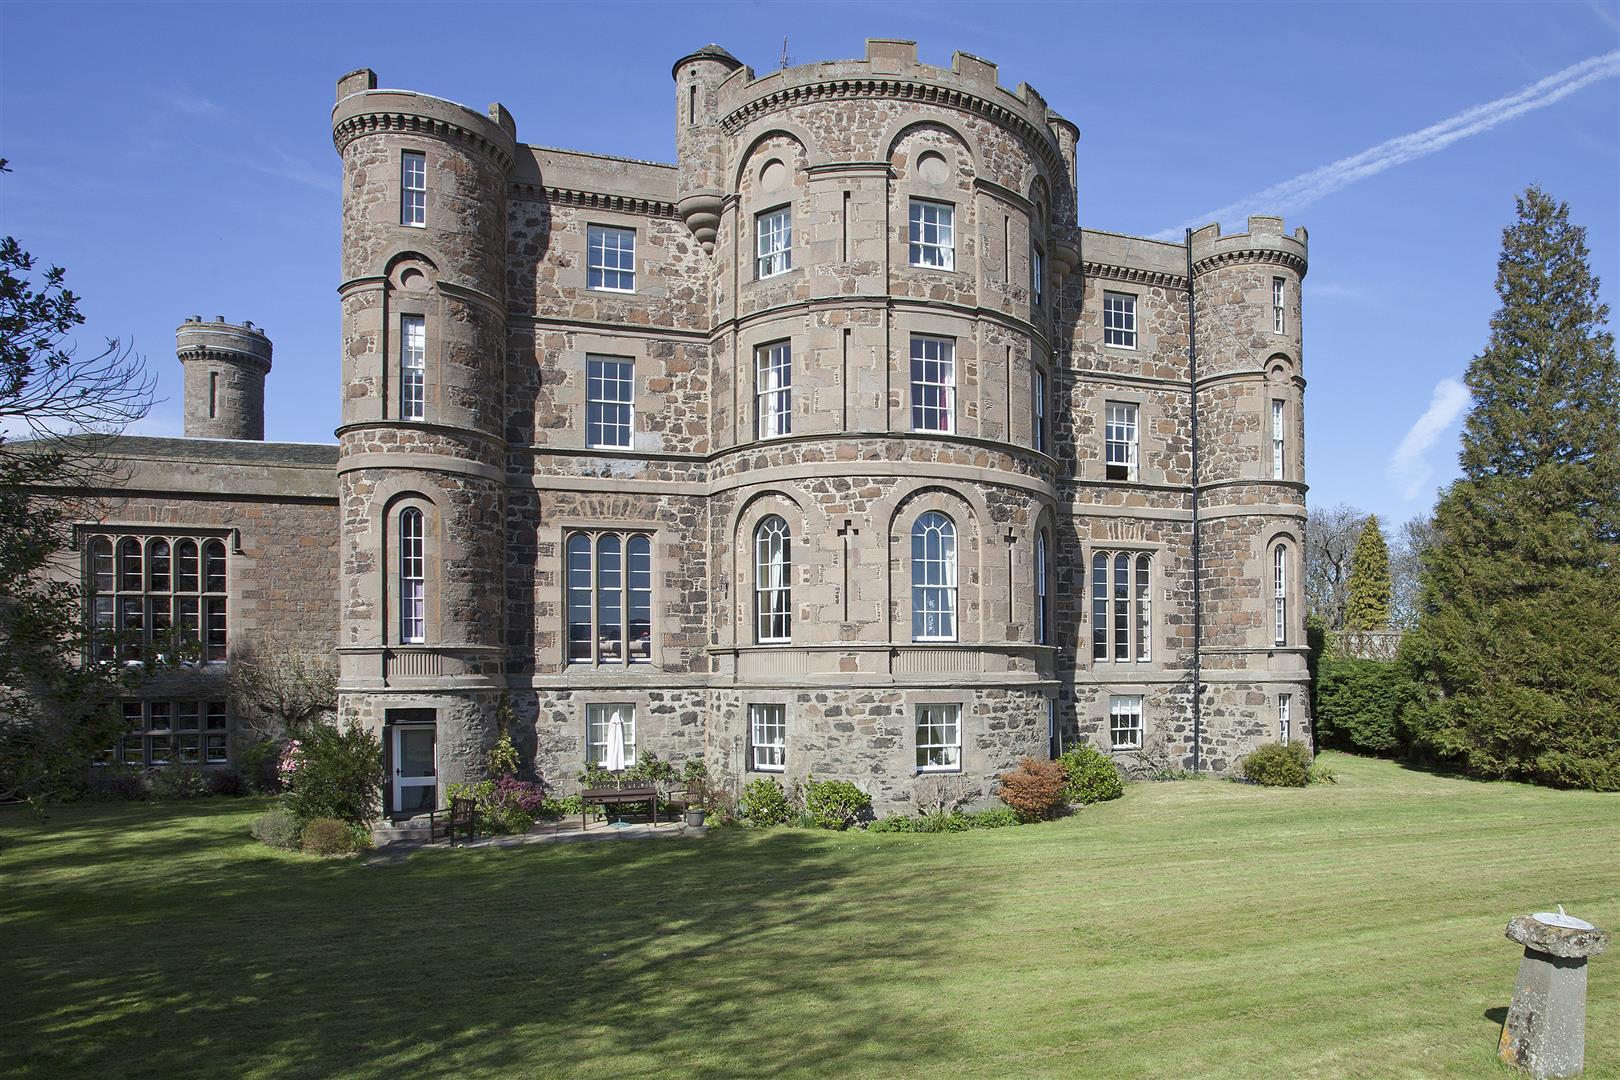 Flat 6, Pitfour Castle, St Madoes, Perth, Perthshire, PH2 7NJ, UK